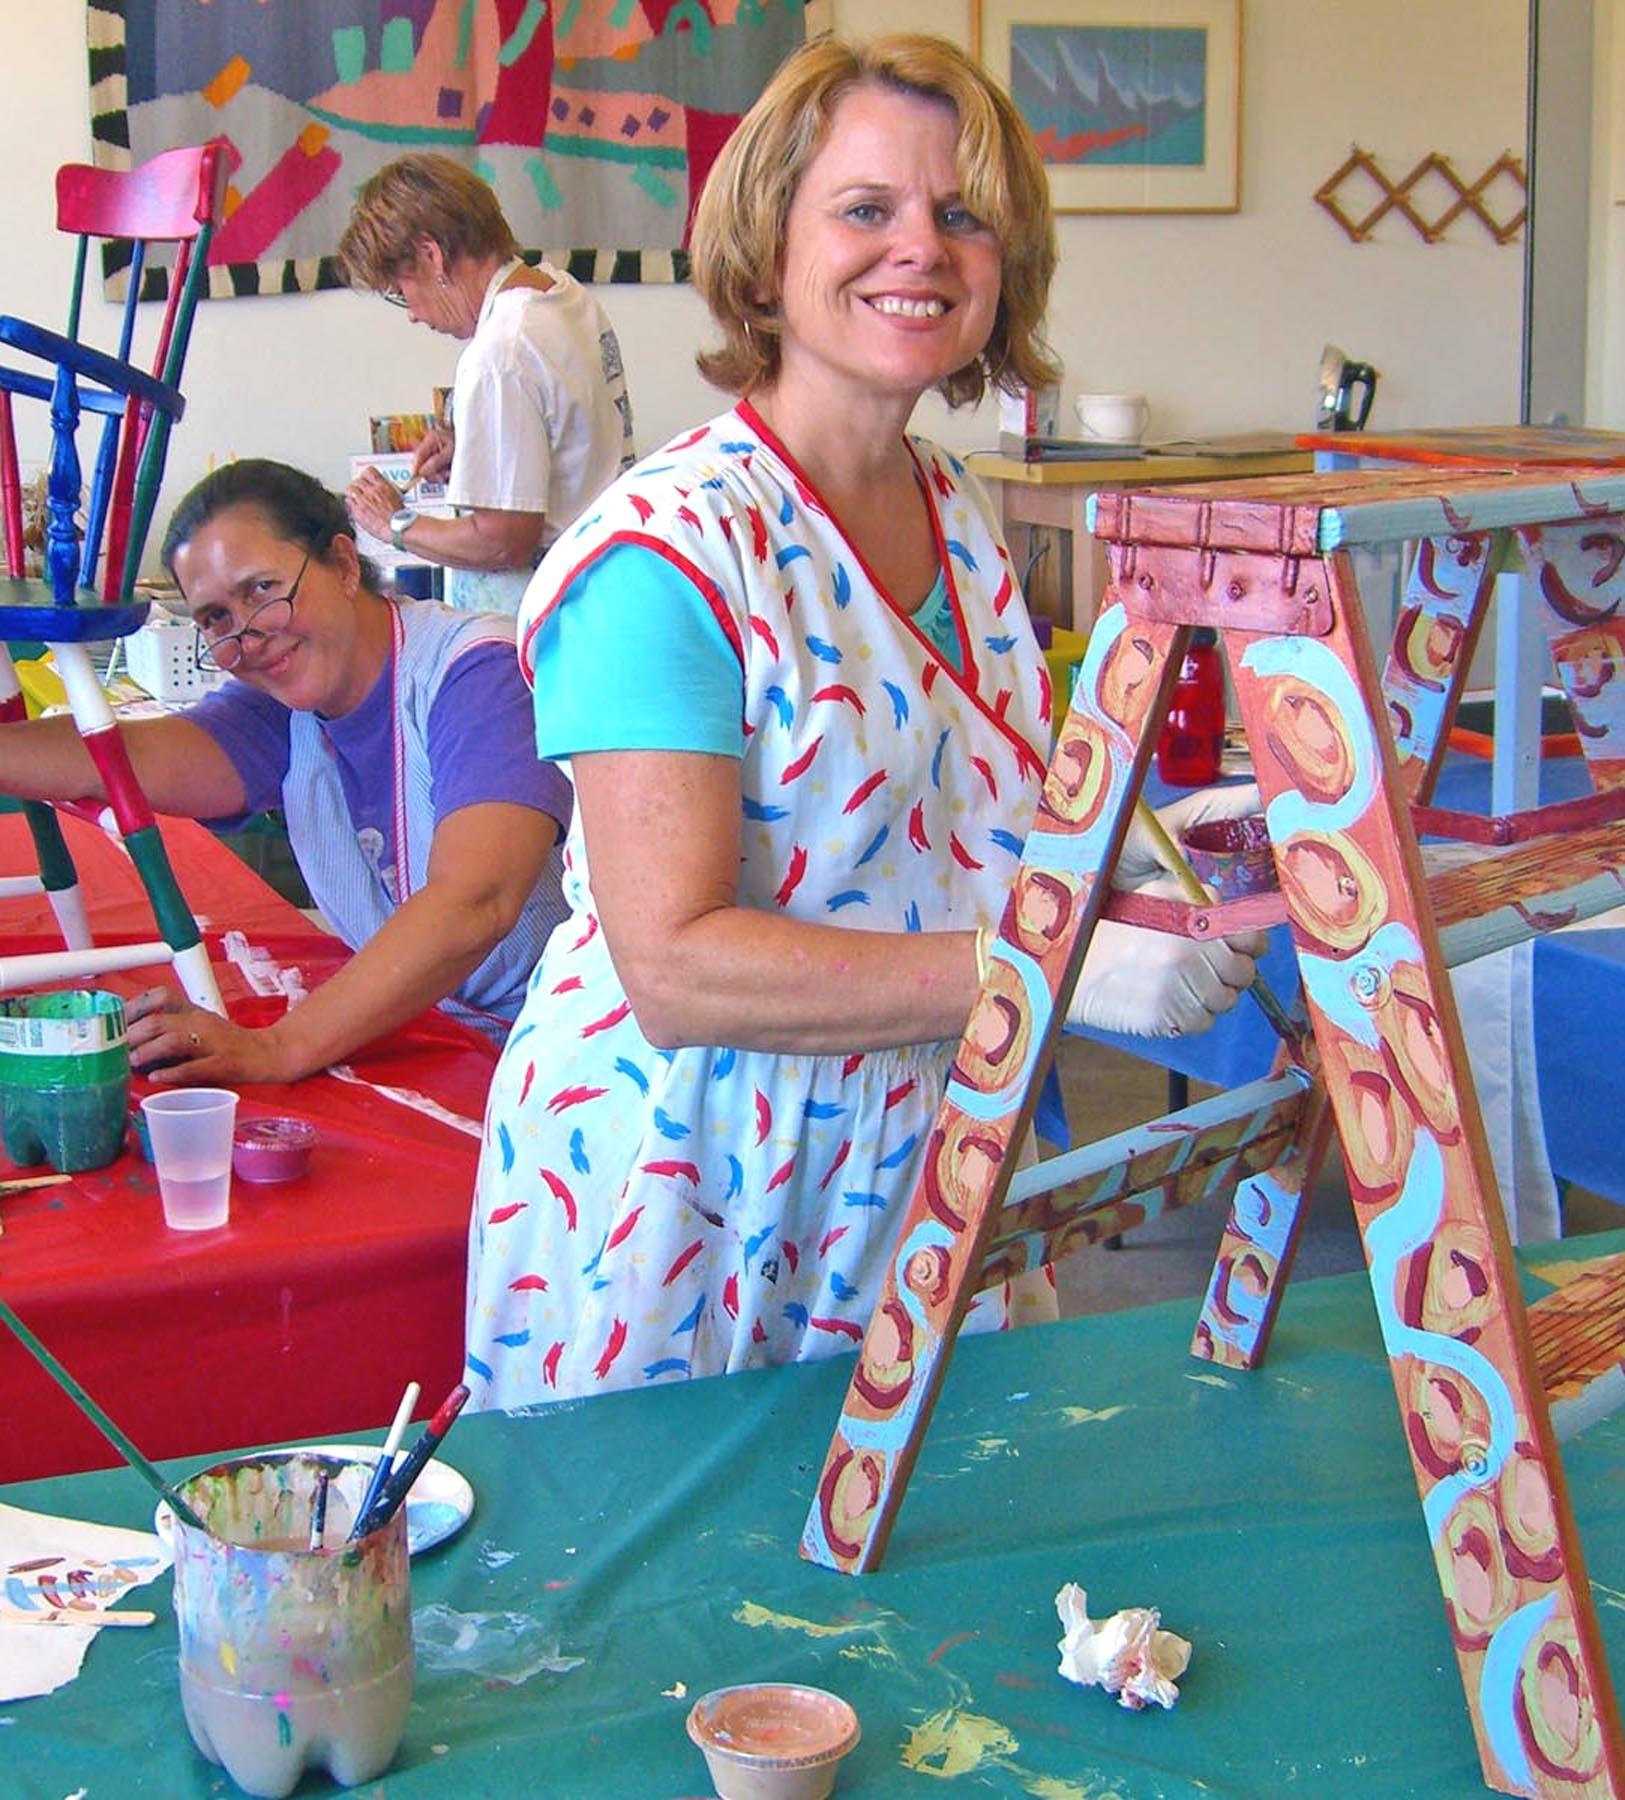 Painted Furniture workshops at Bravo School of Art